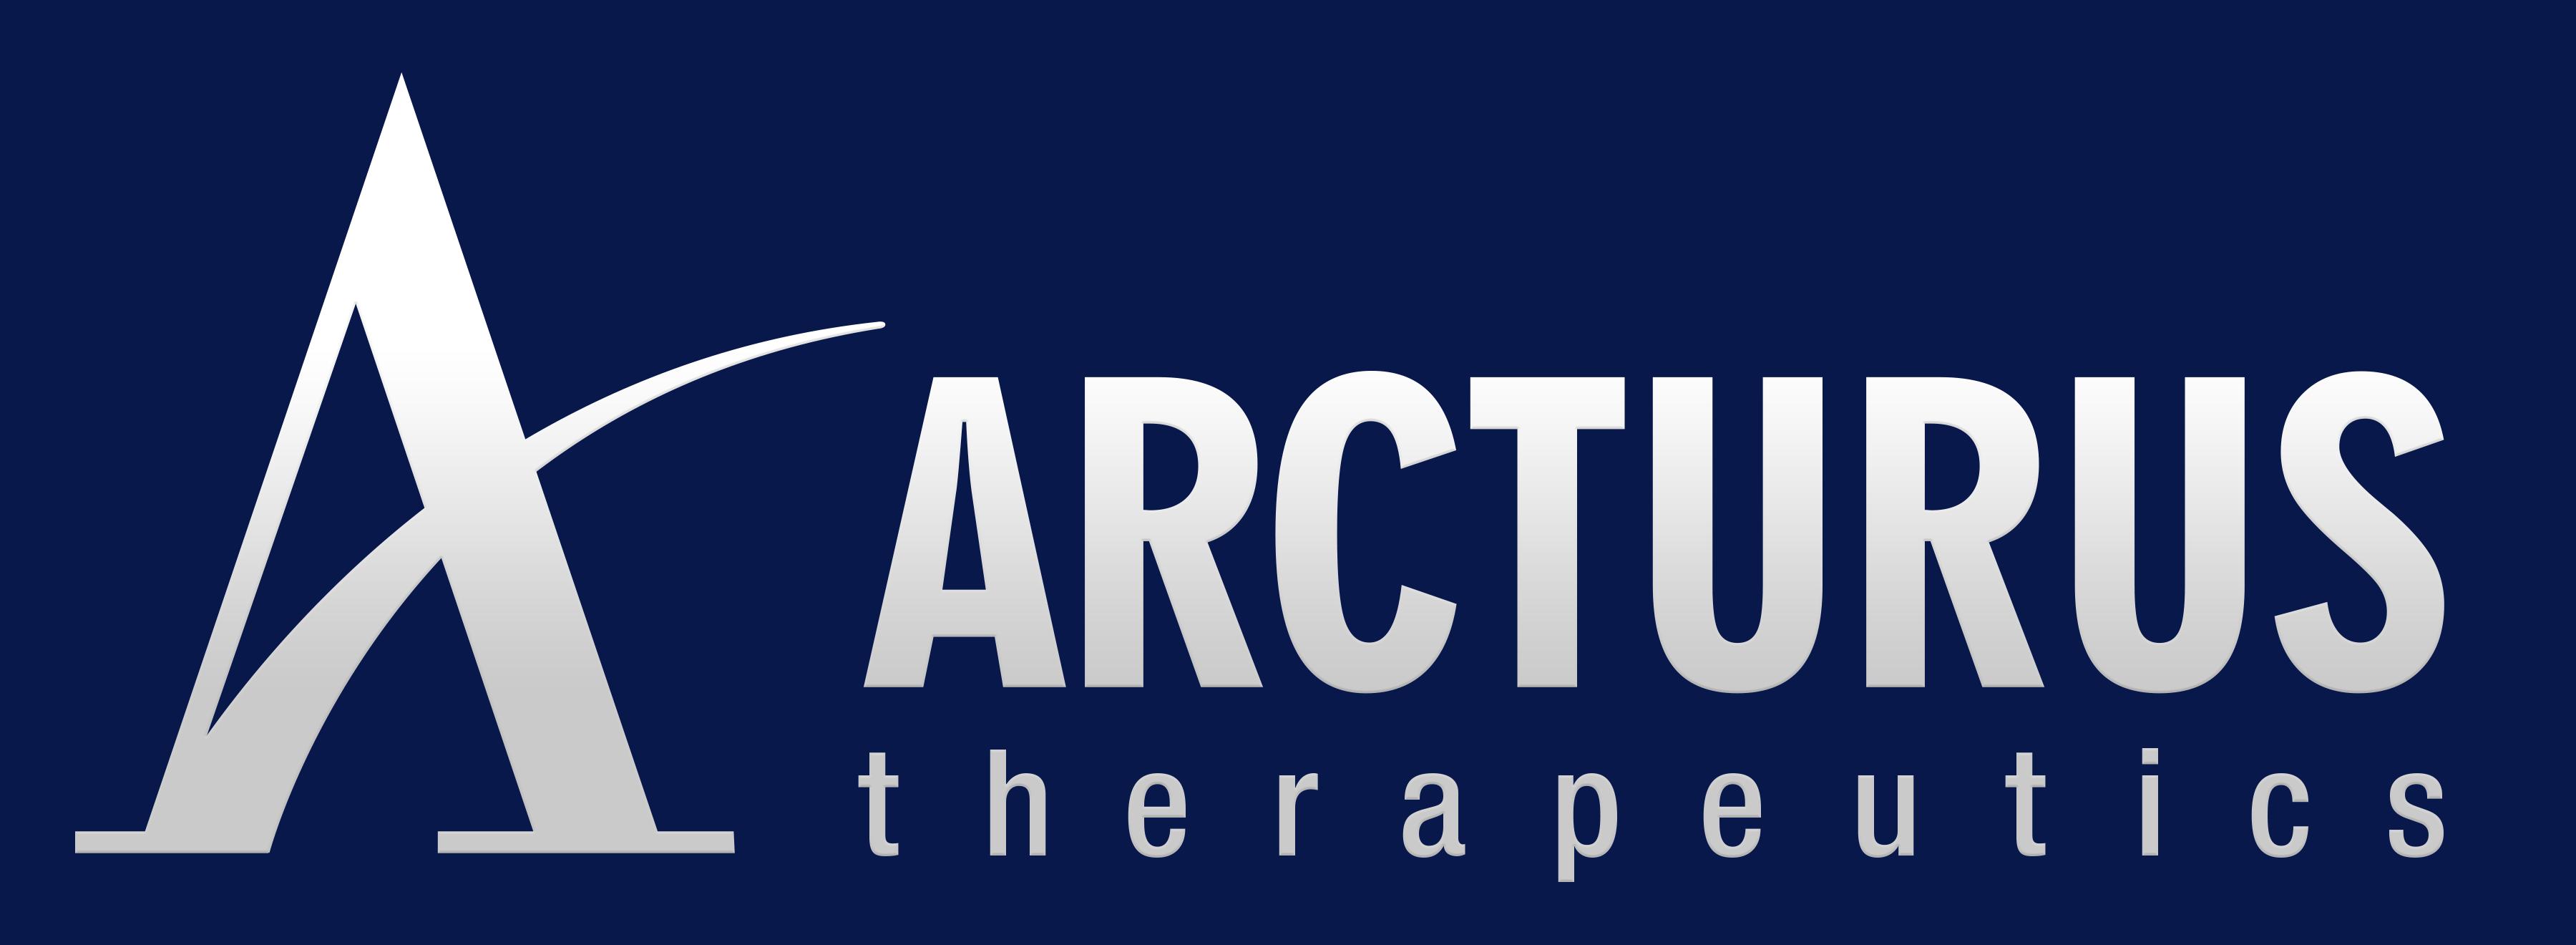 arcturus-logo-blueback (2) (1)